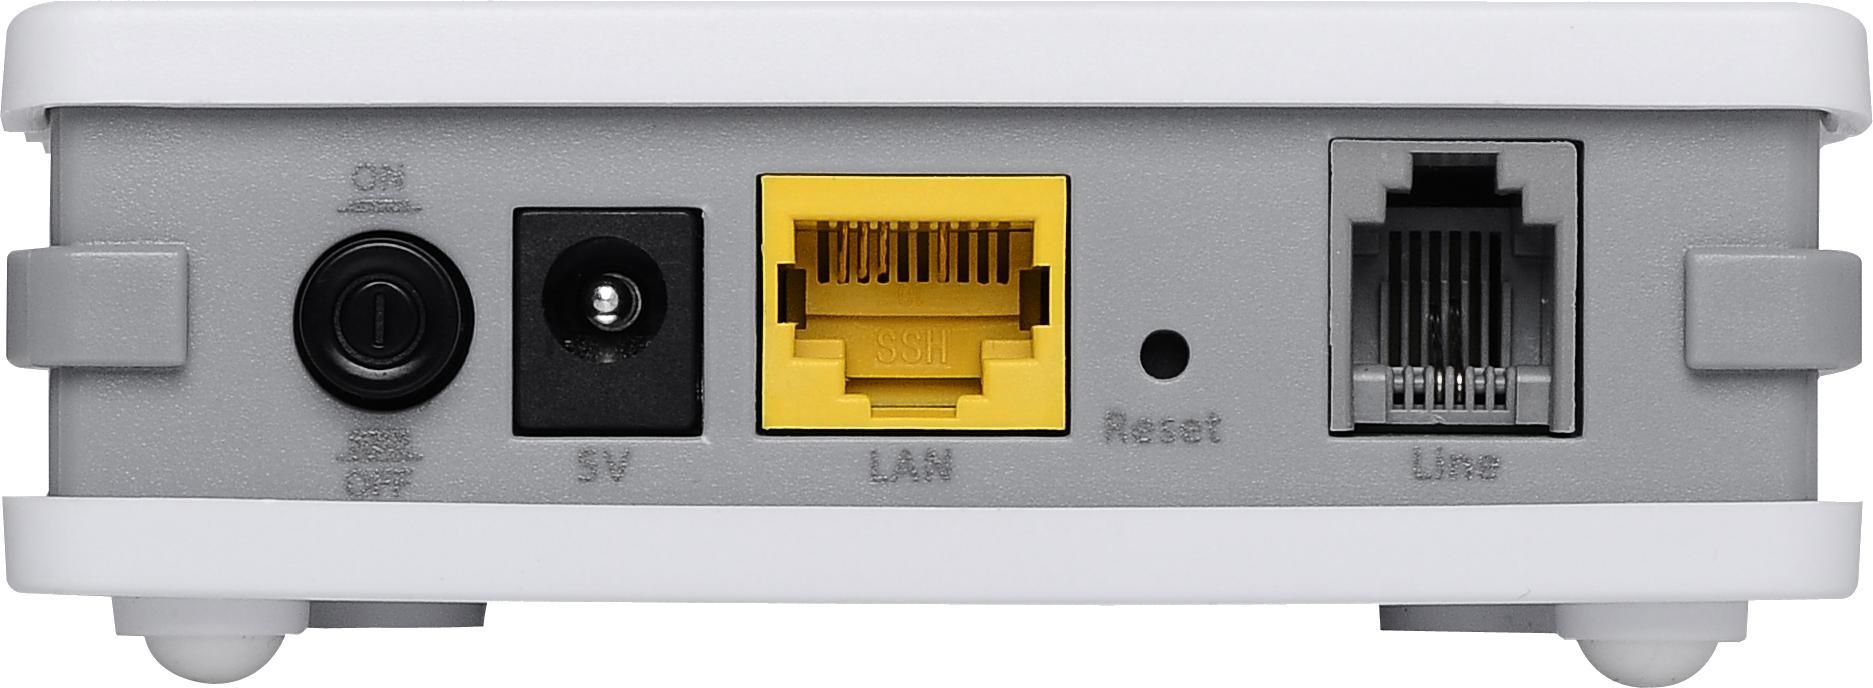 Edimax AR-7211B V2